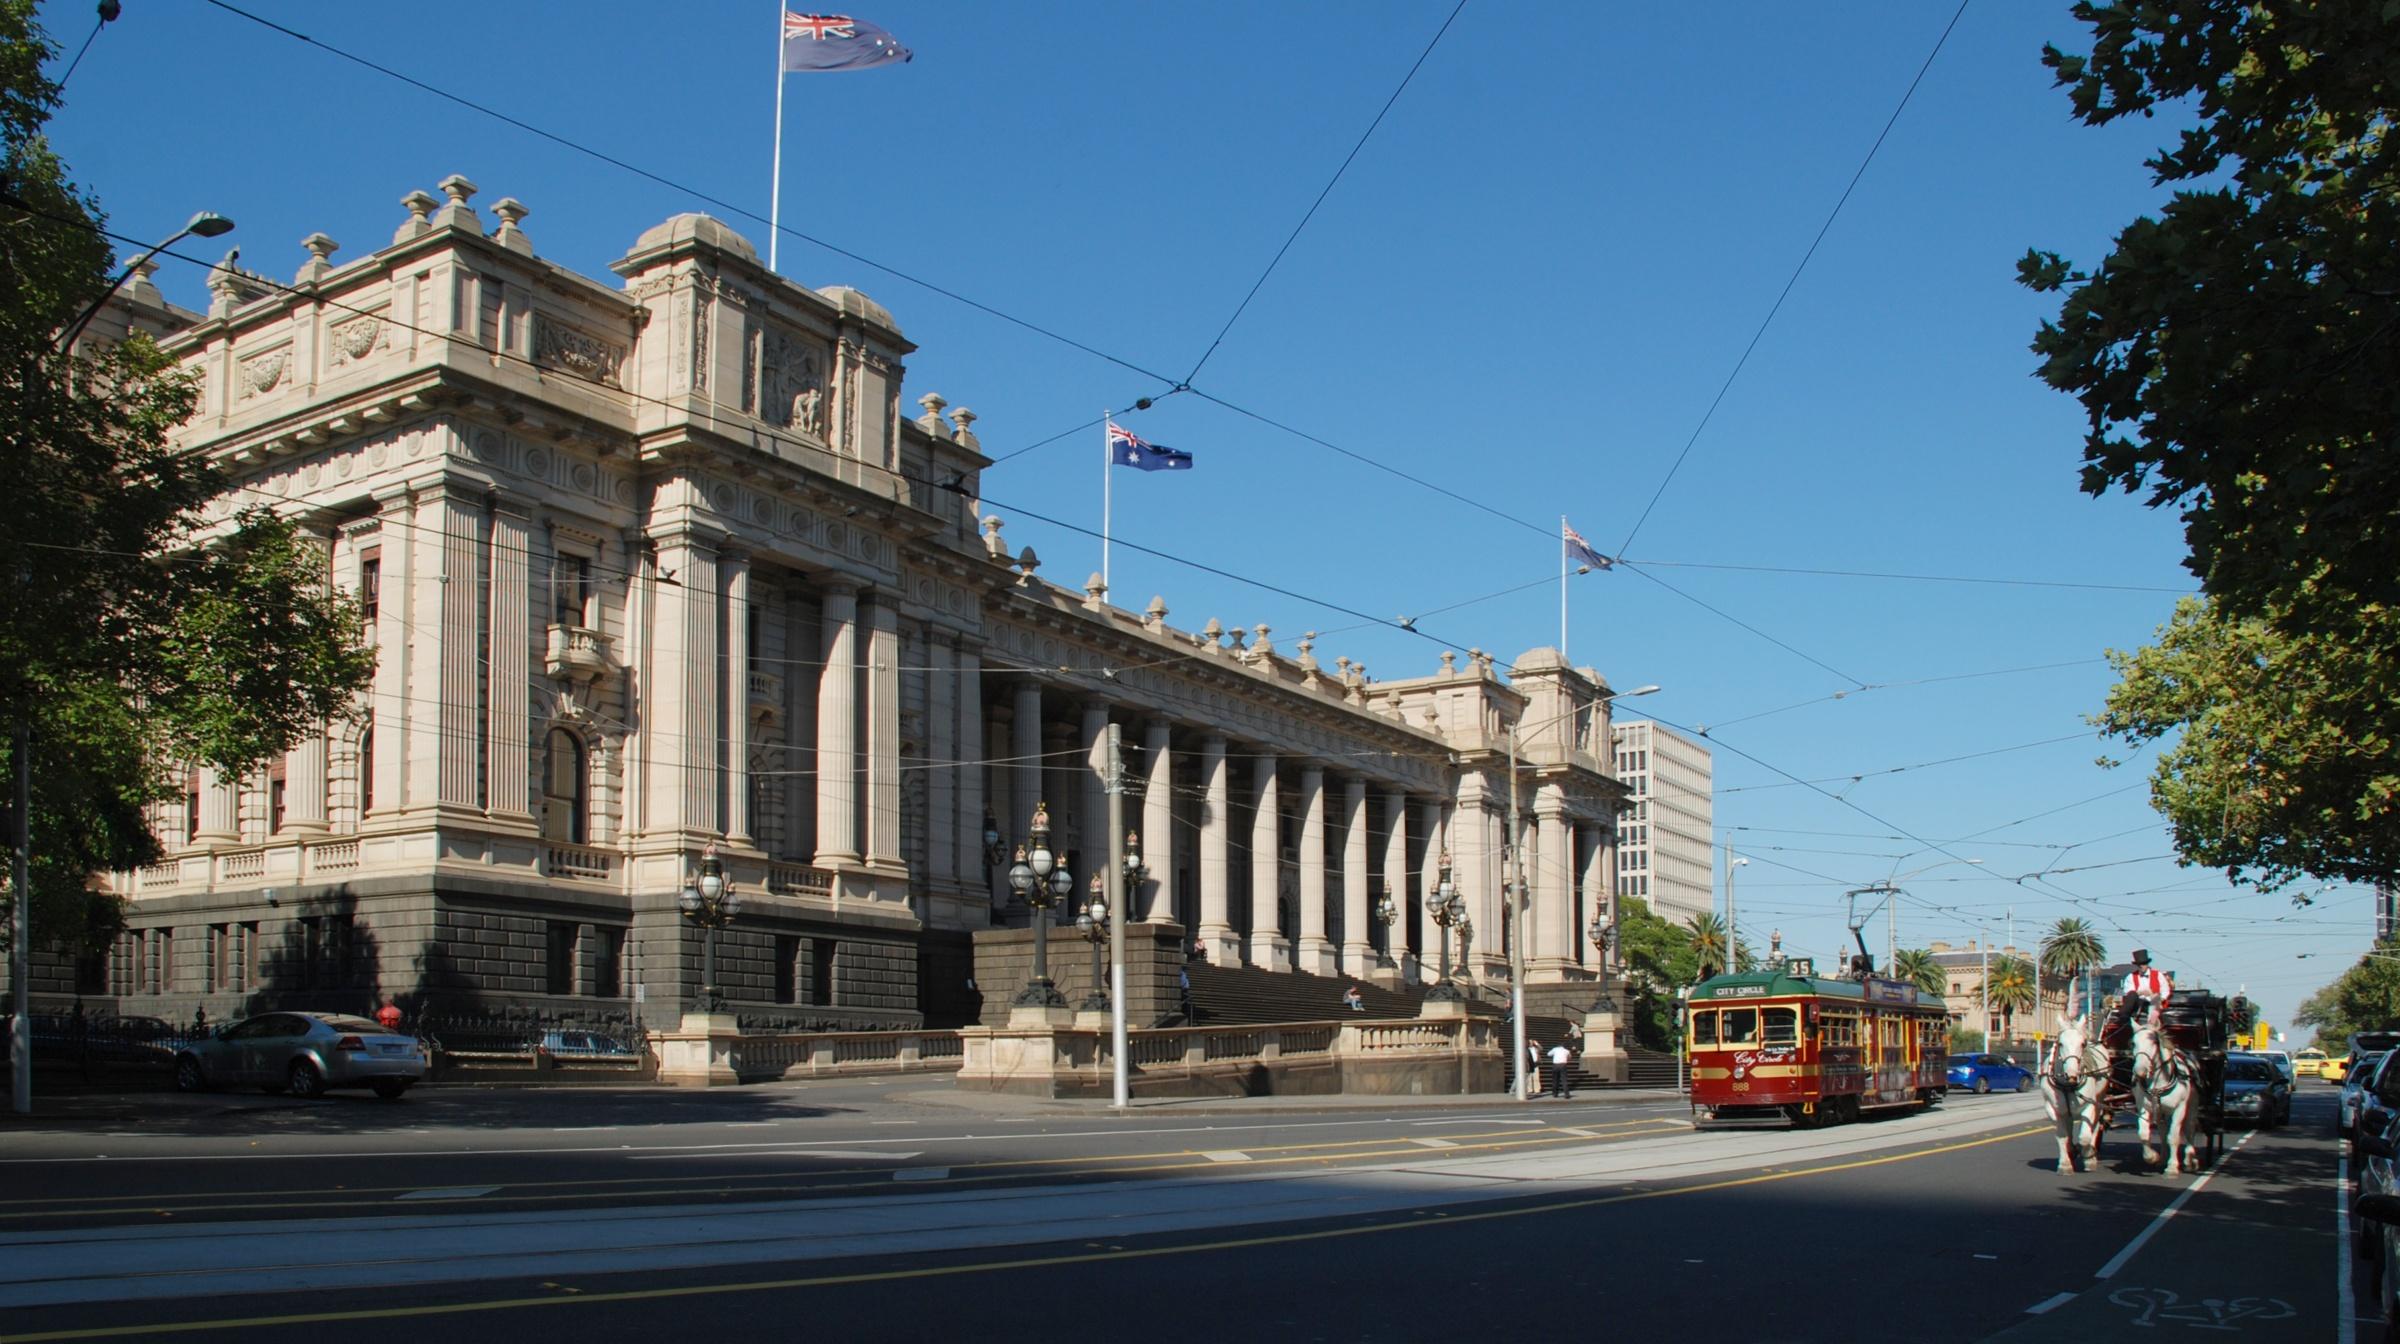 7D6N December Series - Parliament house